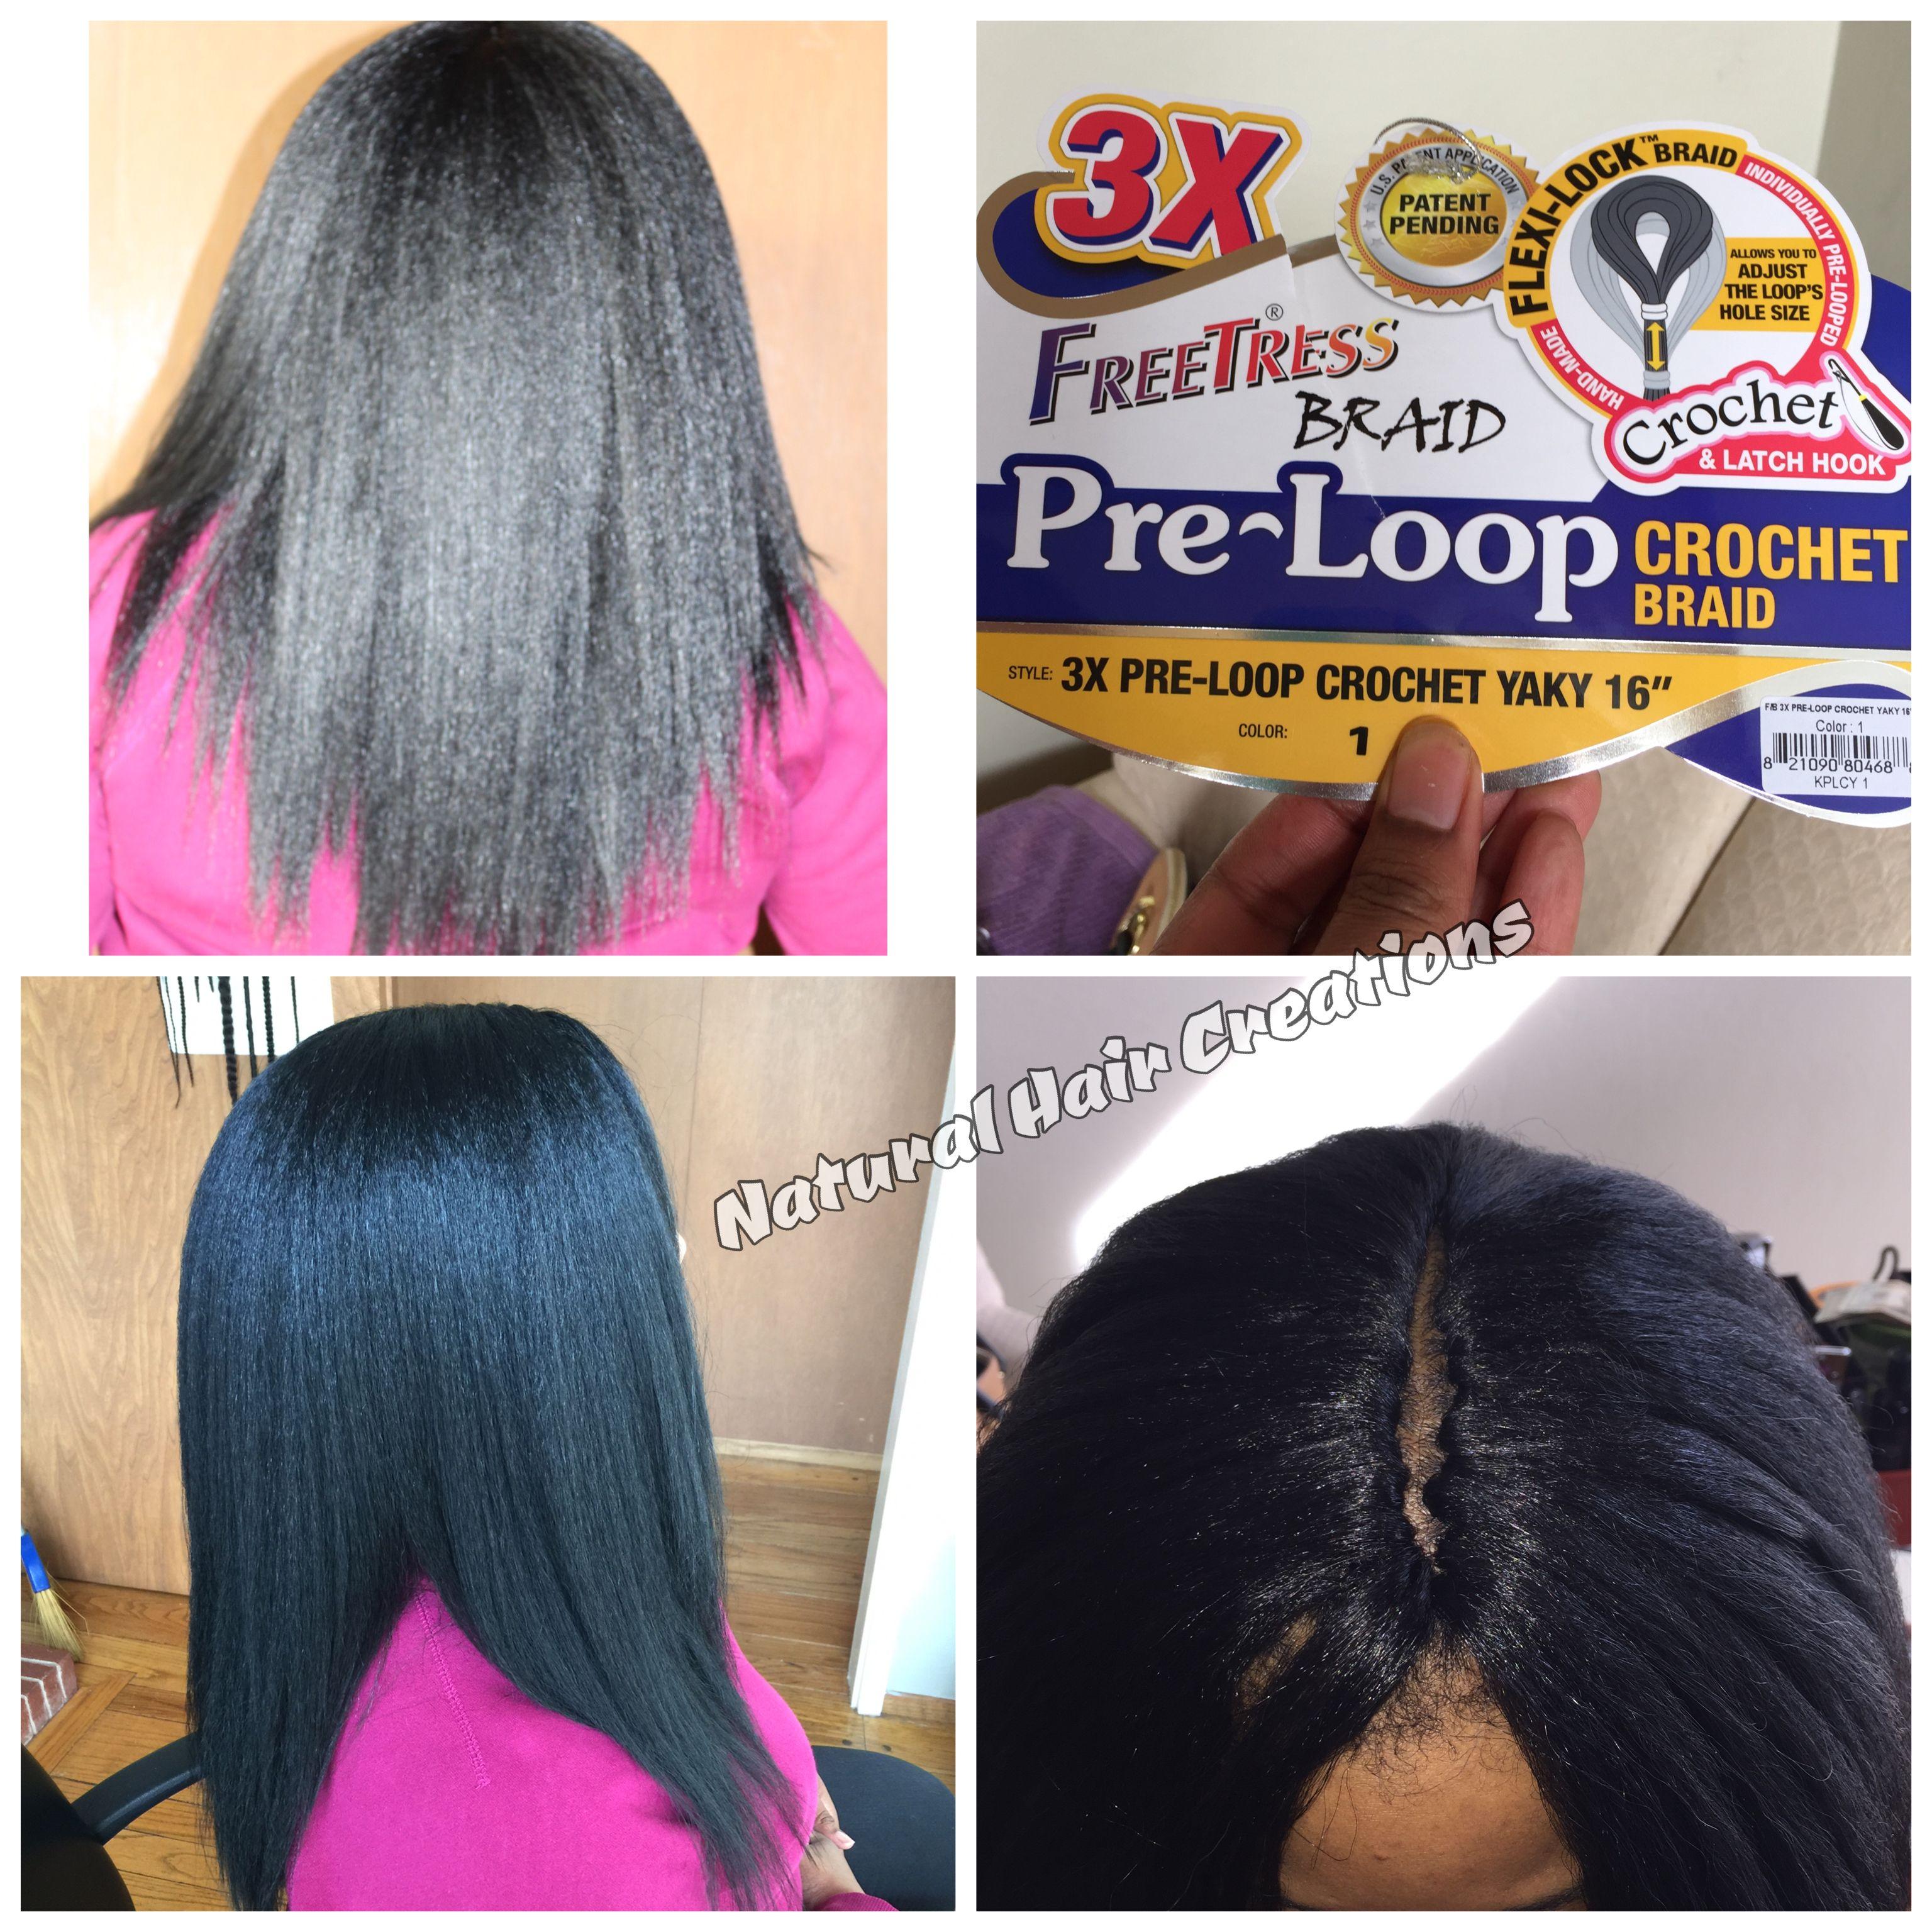 Pre loop crochet braids yaki hair straight my work pinterest pre loop crochet braids yaki hair straight pmusecretfo Choice Image